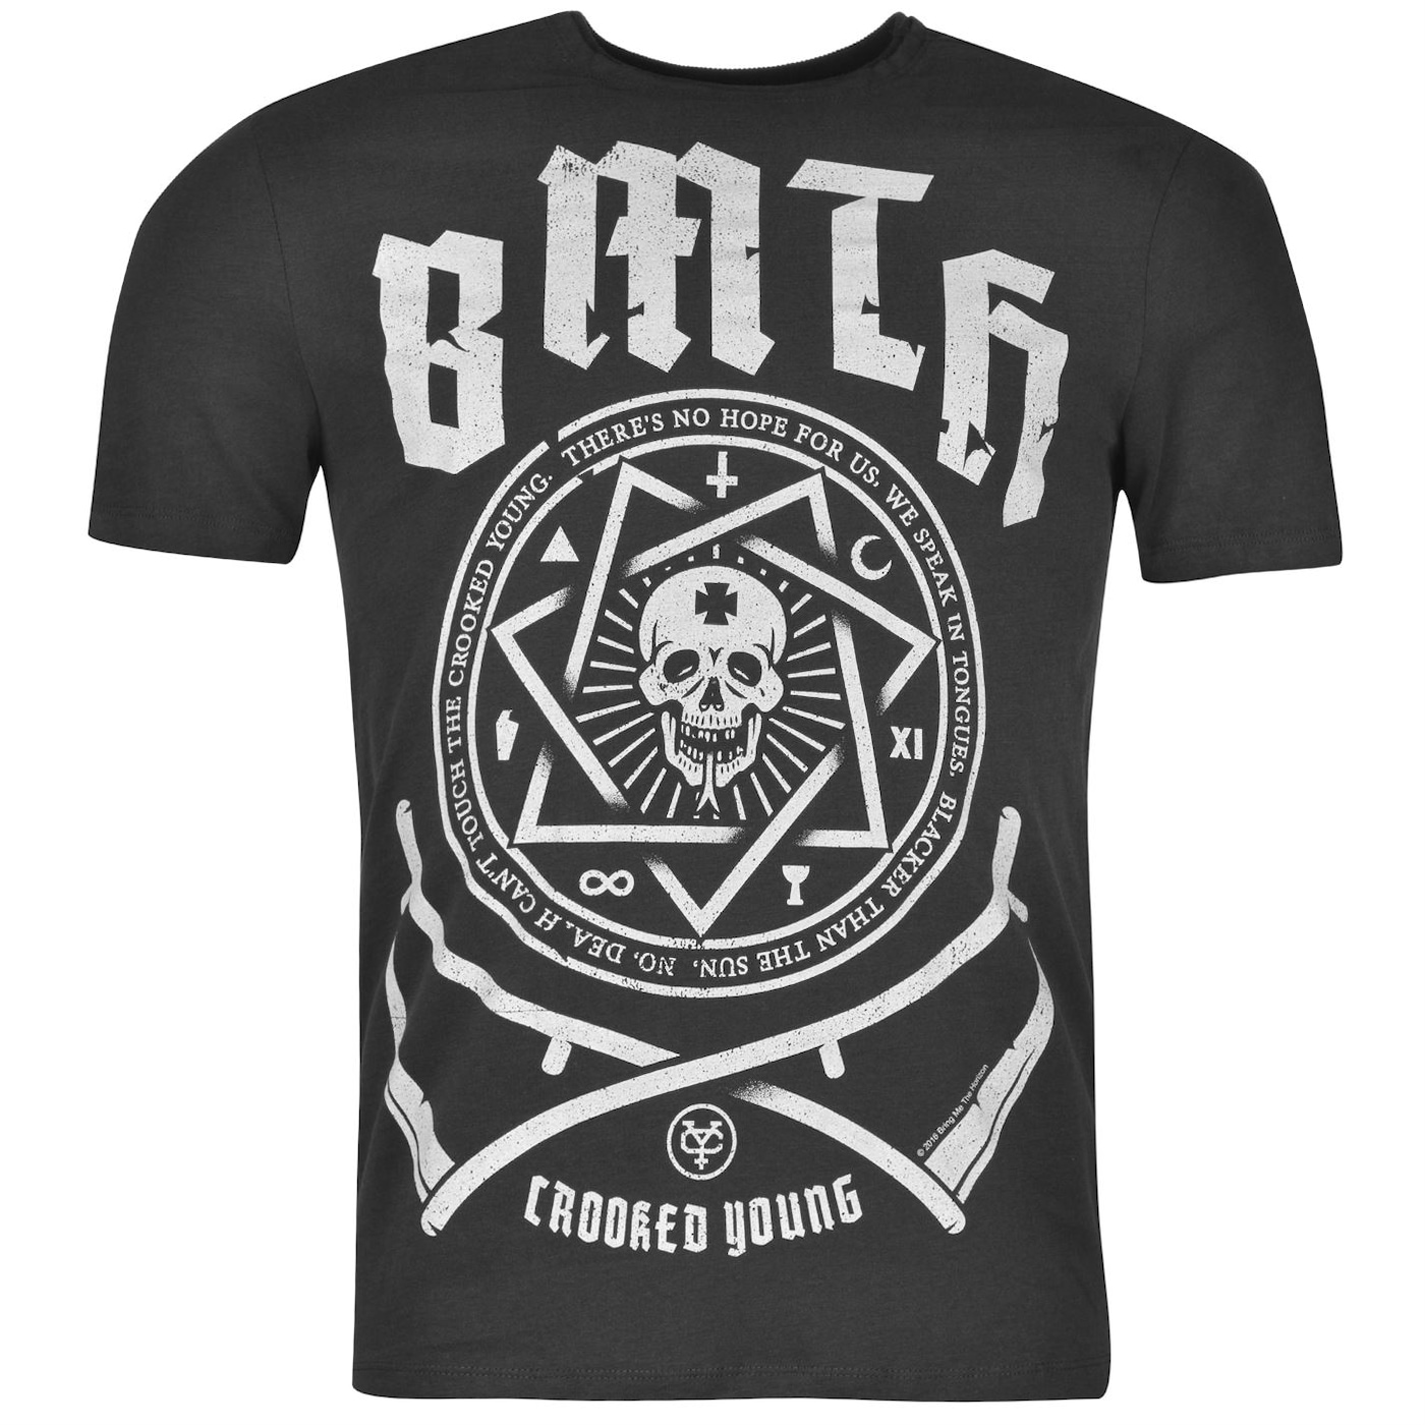 Amplified Clothing Bring Me The Horizon T Shirt Mens